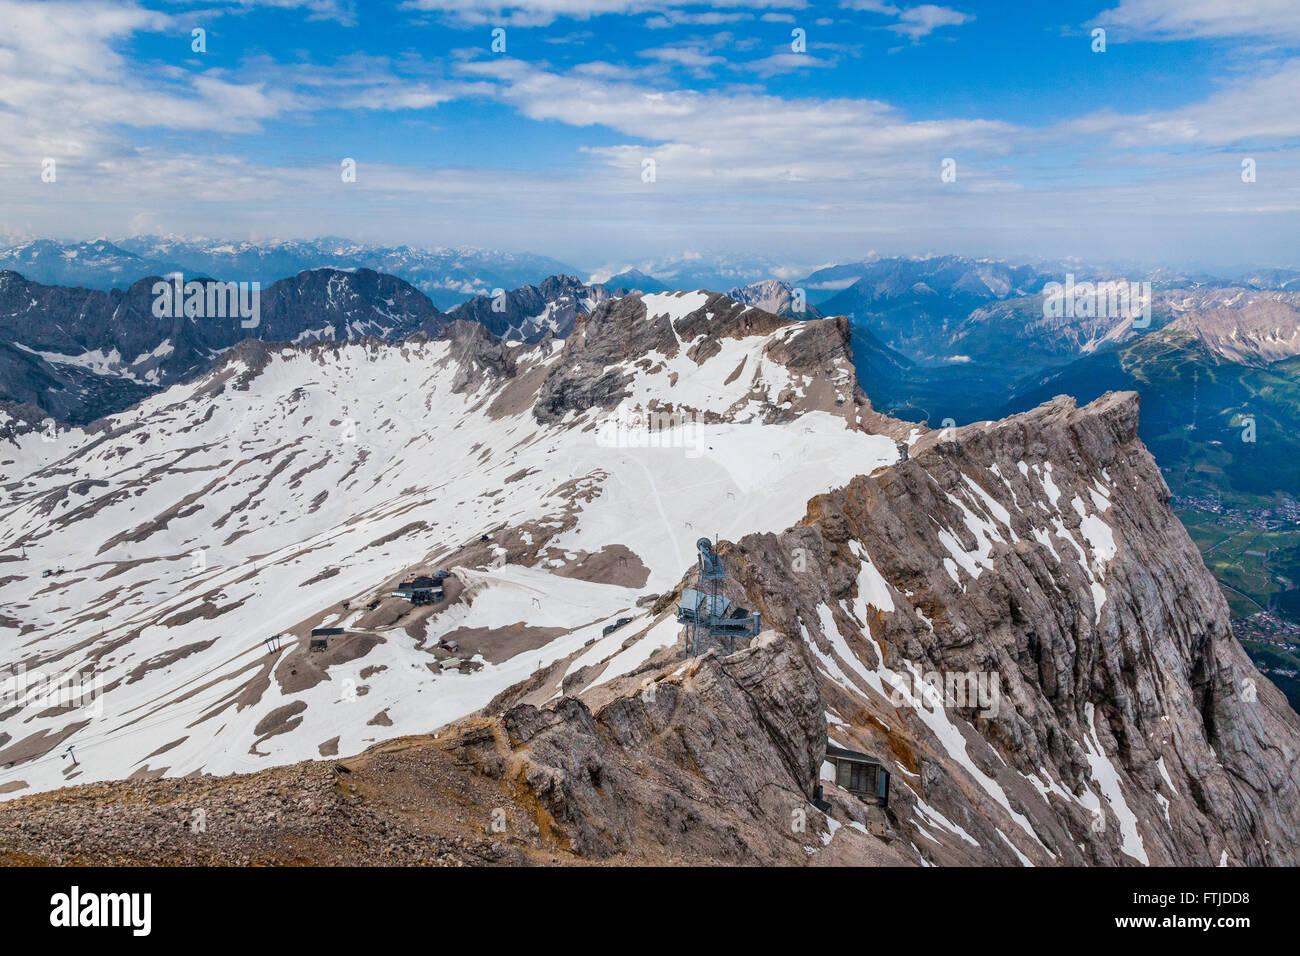 Zugspitzeck Zugspitzplatt et, le sommet de la Zugspitze, Alpes bavaroises, du Wetterstein, Bavière, Allemagne Photo Stock